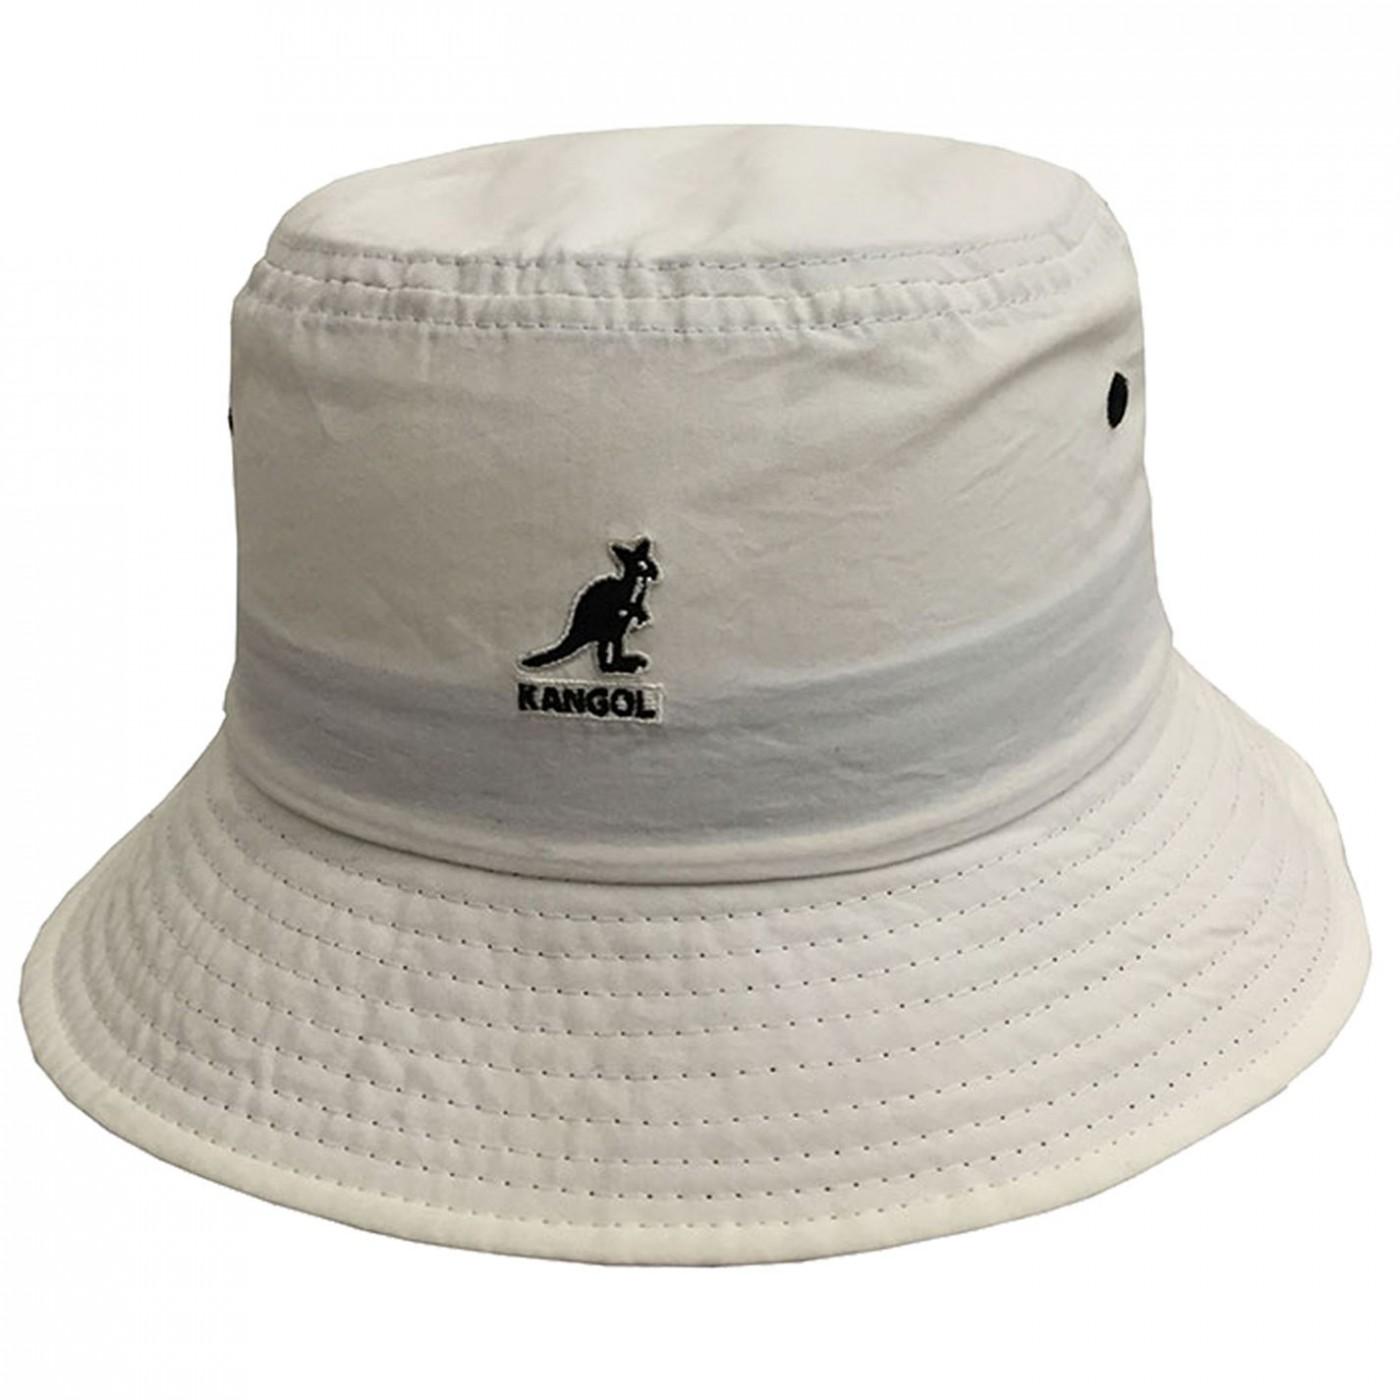 Šešir Kangol - Sport Bucket Hat - Jeftinije.hr 53fd81a2037f